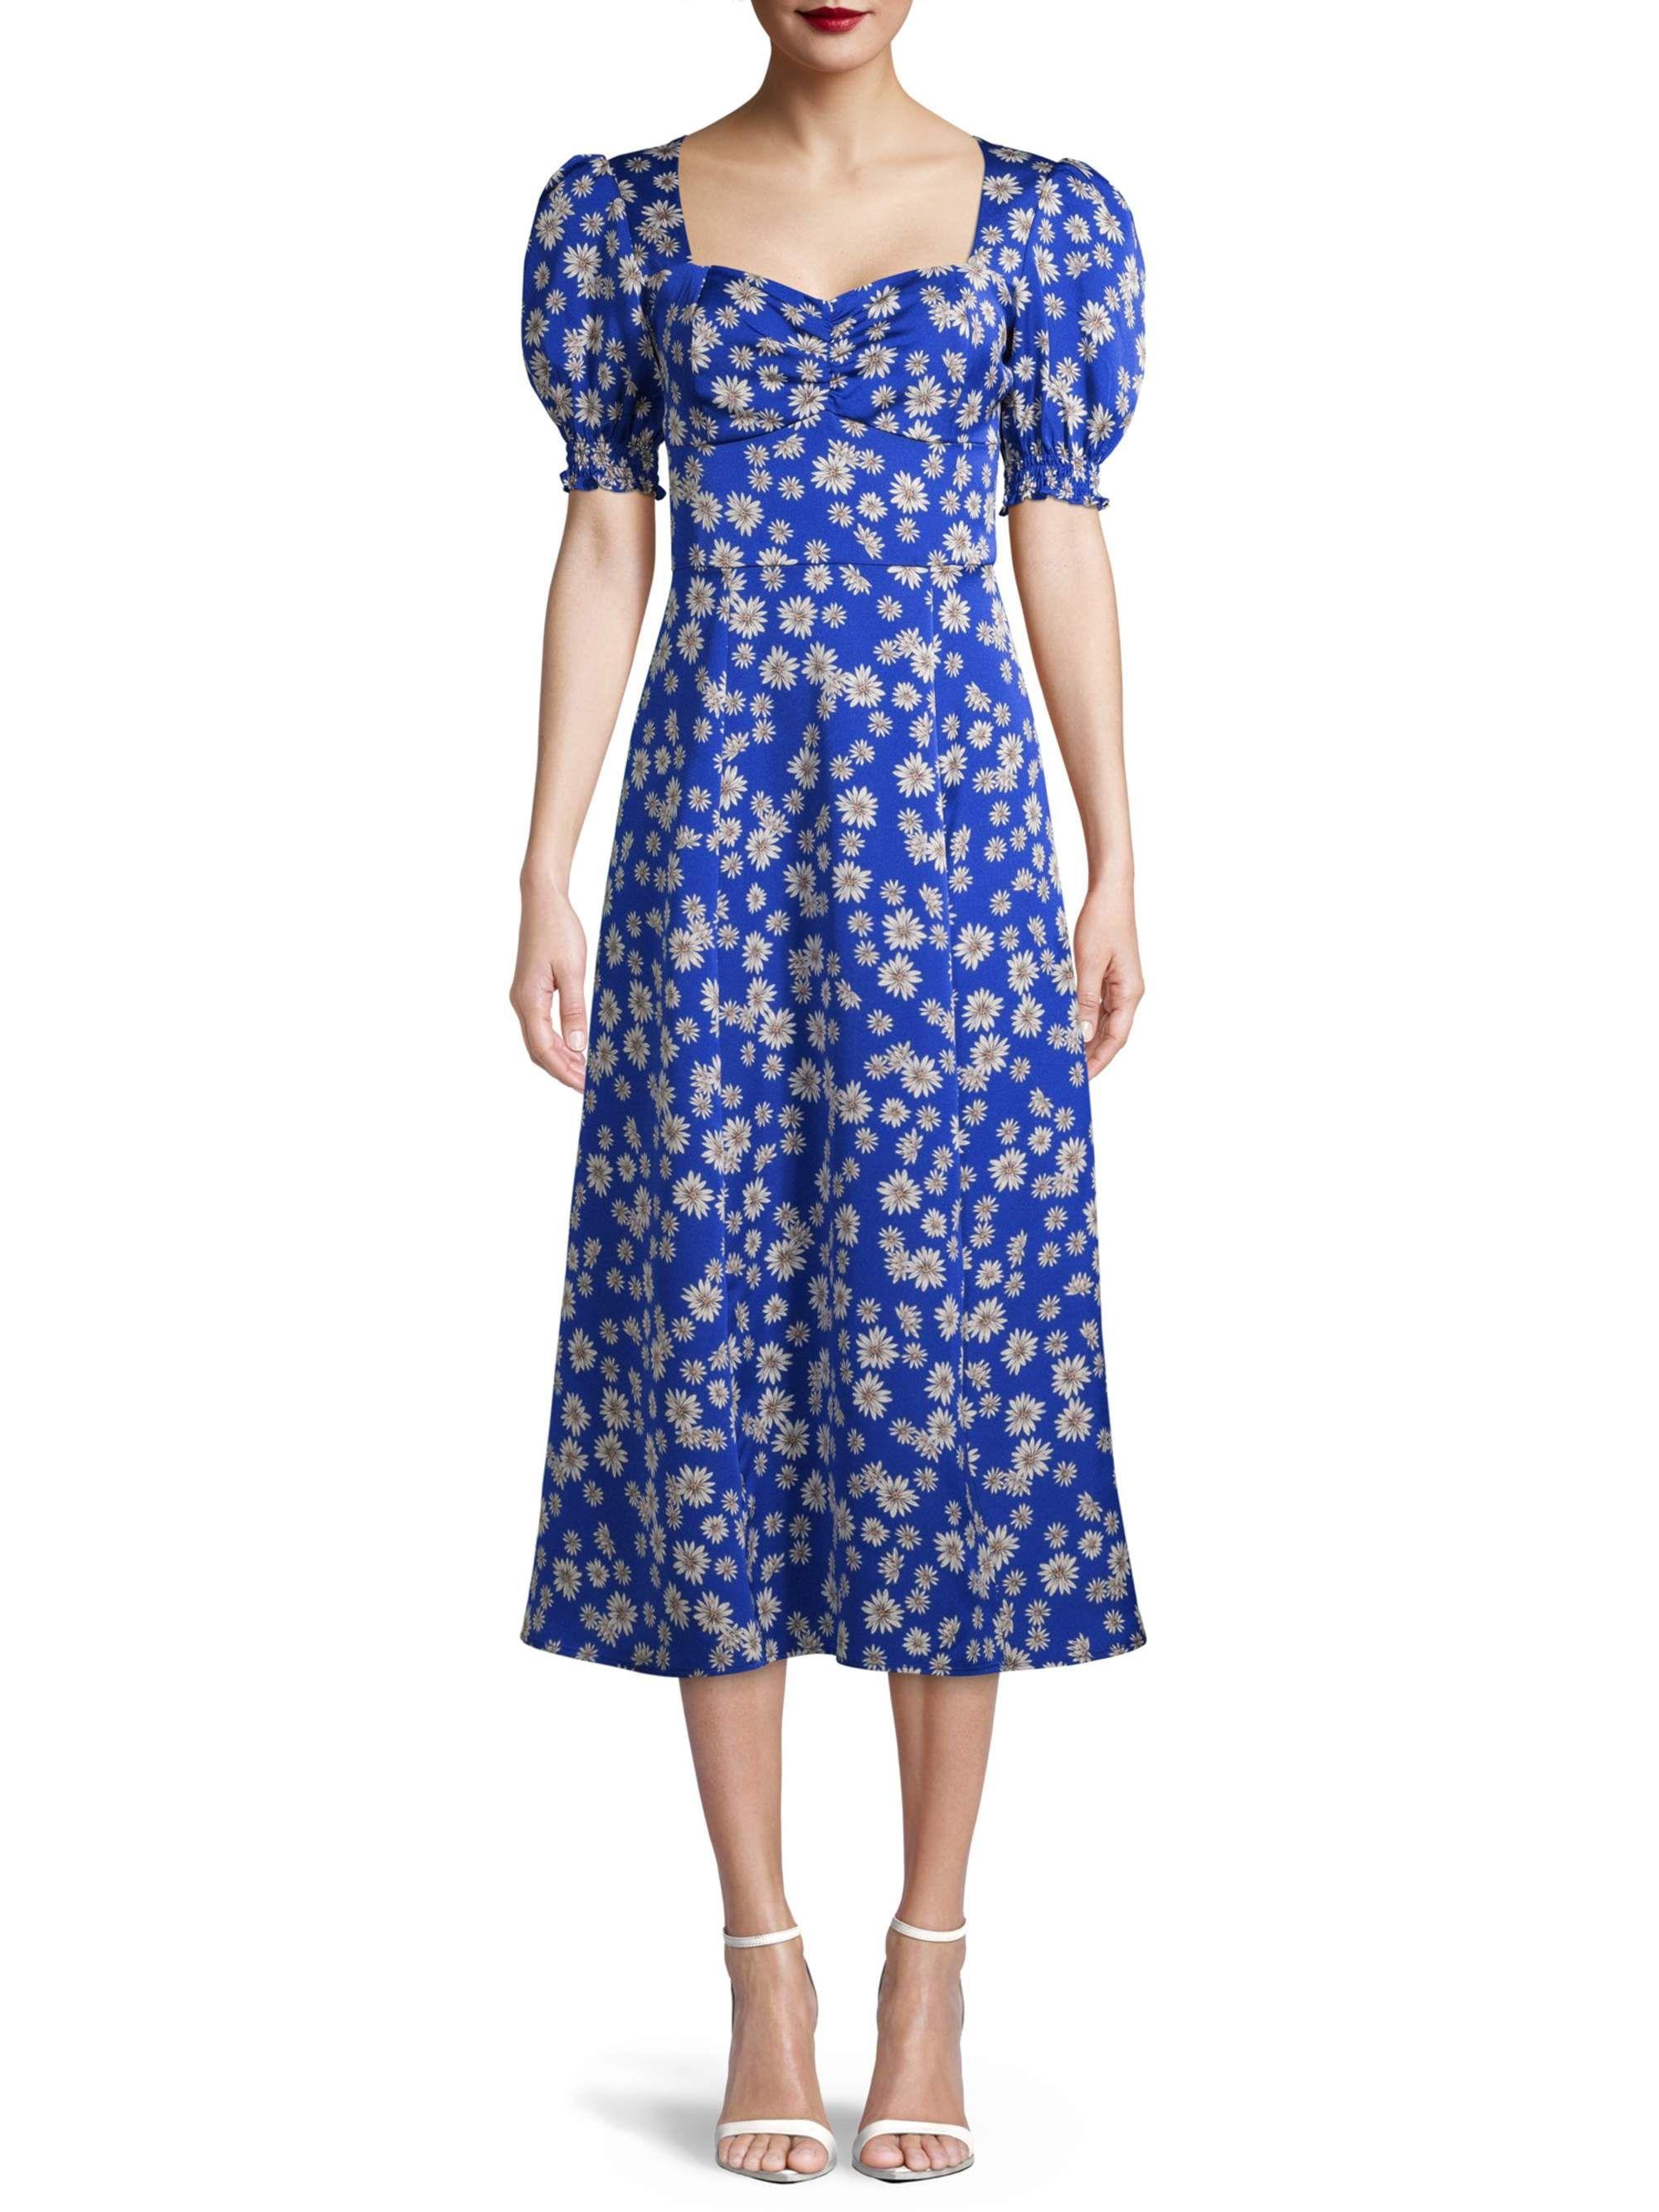 Prospect The Label Prospect The Label Women S Bustier Midi Dress Walmart Com Midi Dress Dresses Bustier [ 2667 x 2000 Pixel ]